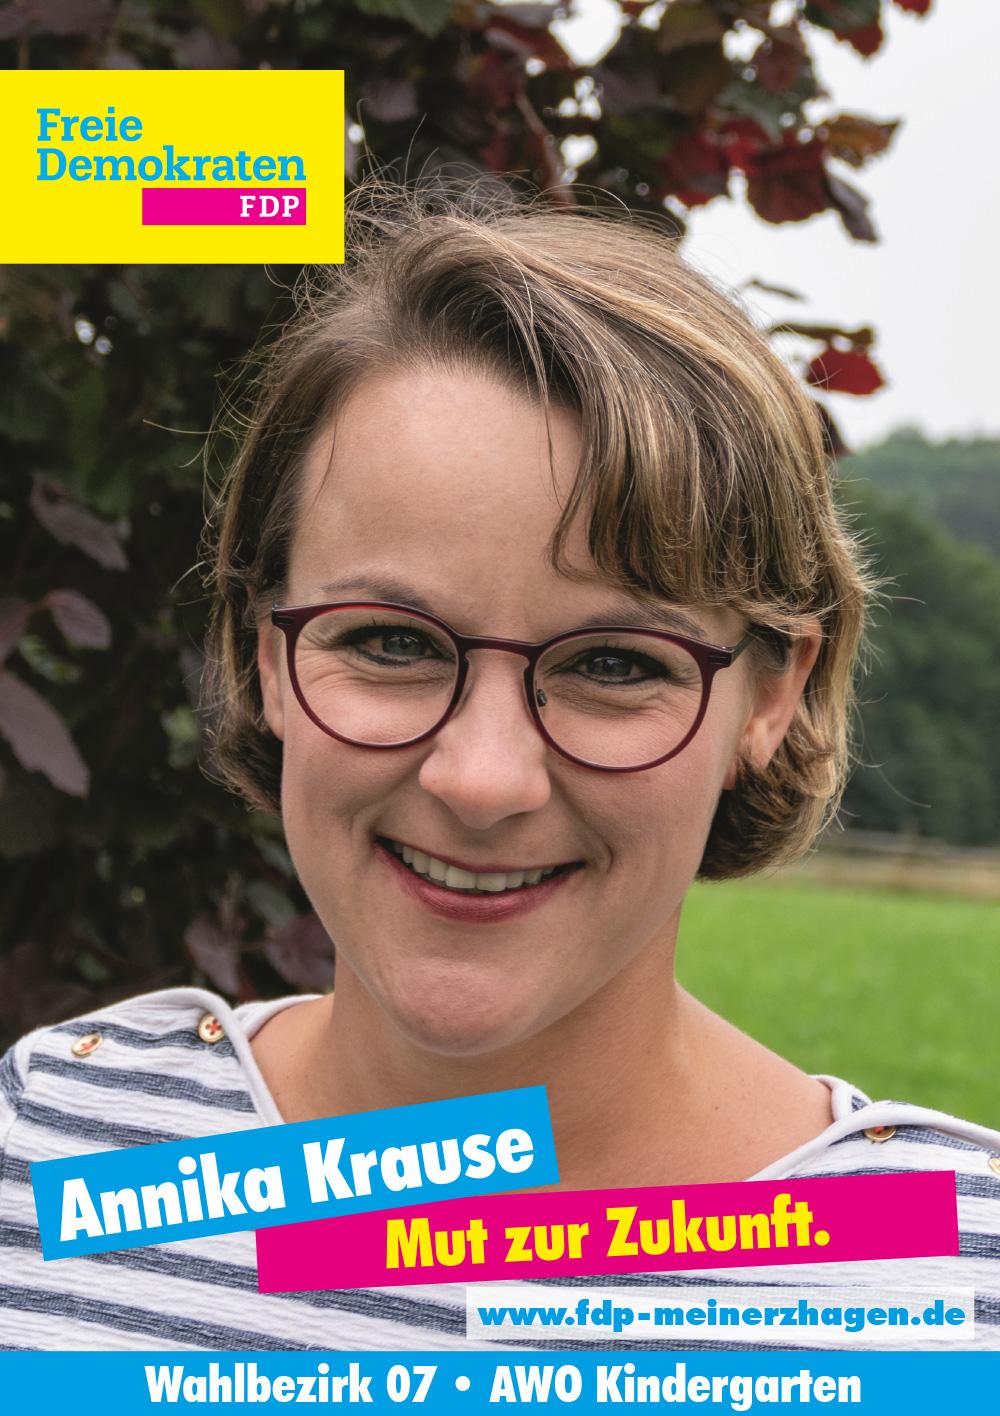 Wahlbezirk 7 - Annika Krause